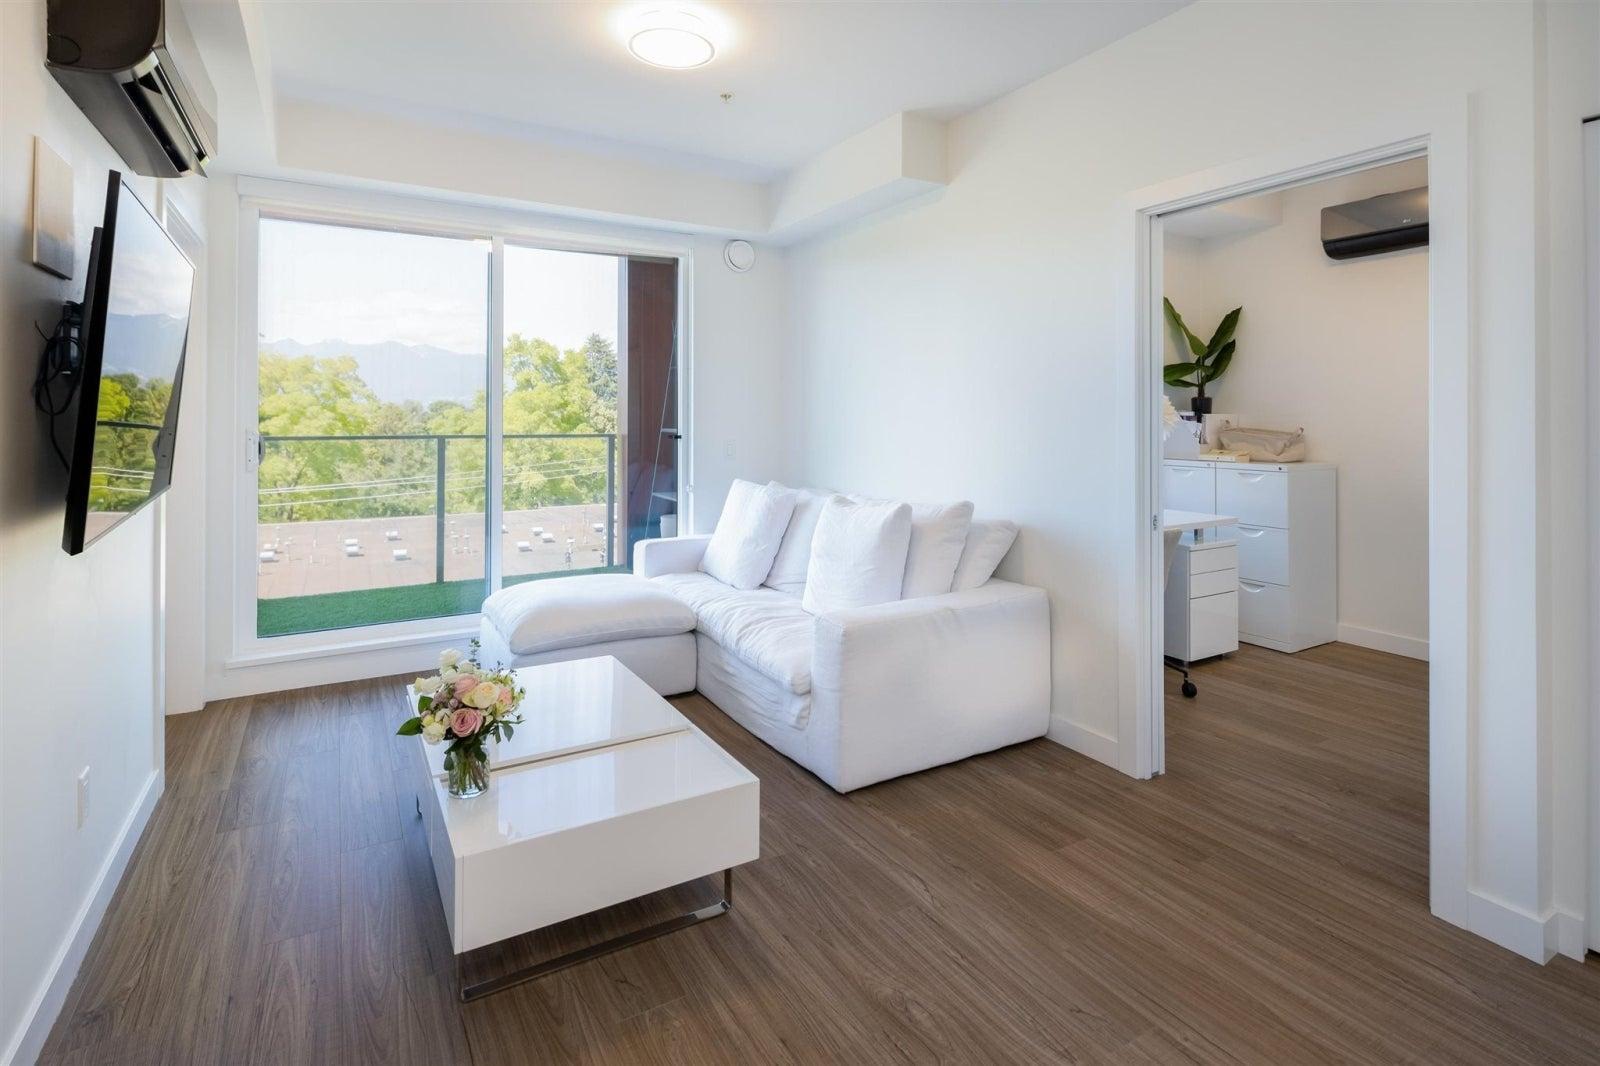 408 379 E BROADWAY AVENUE - Mount Pleasant VE Apartment/Condo for sale, 2 Bedrooms (R2599900) #6